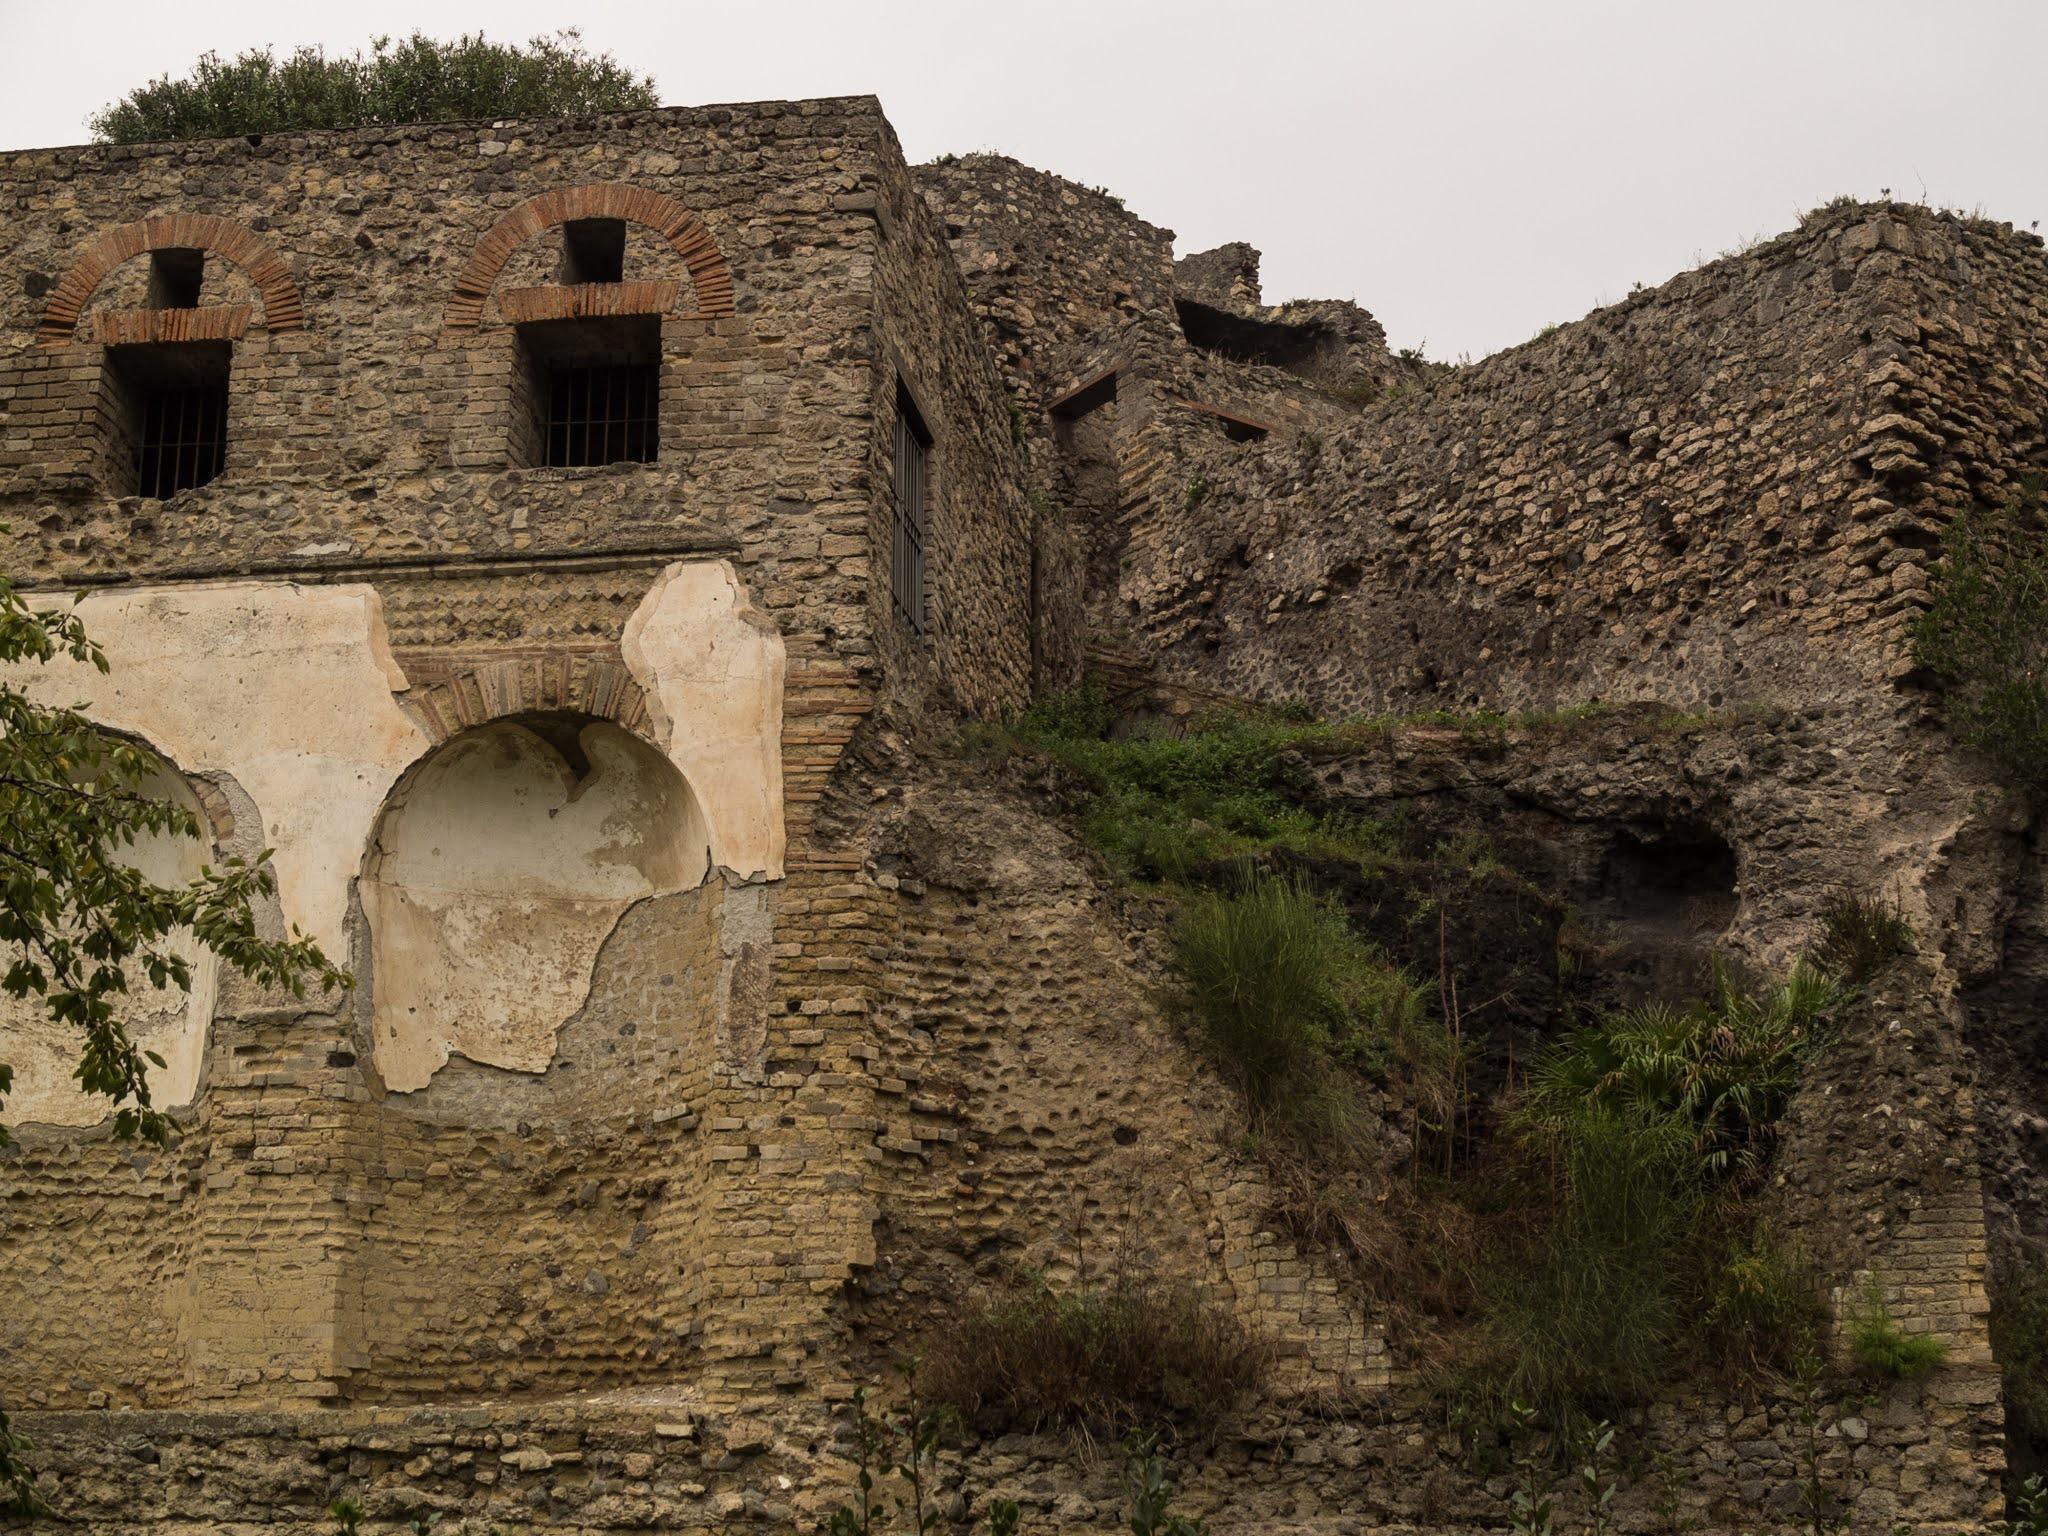 Looking up at doorways and exterior walls in ancient Pompeii.